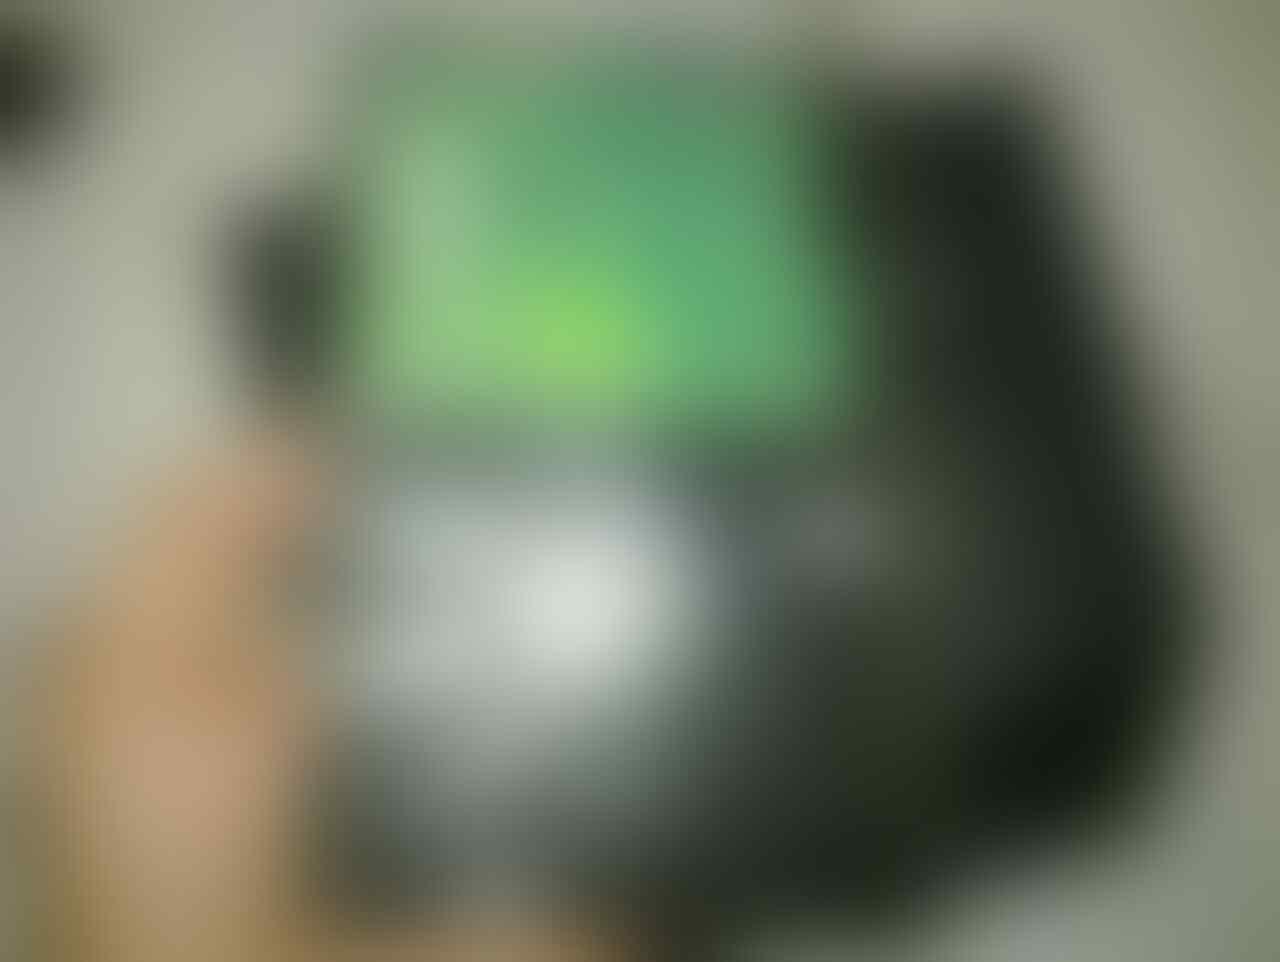 HDD Internal PC Seagate 320GB Full Game.